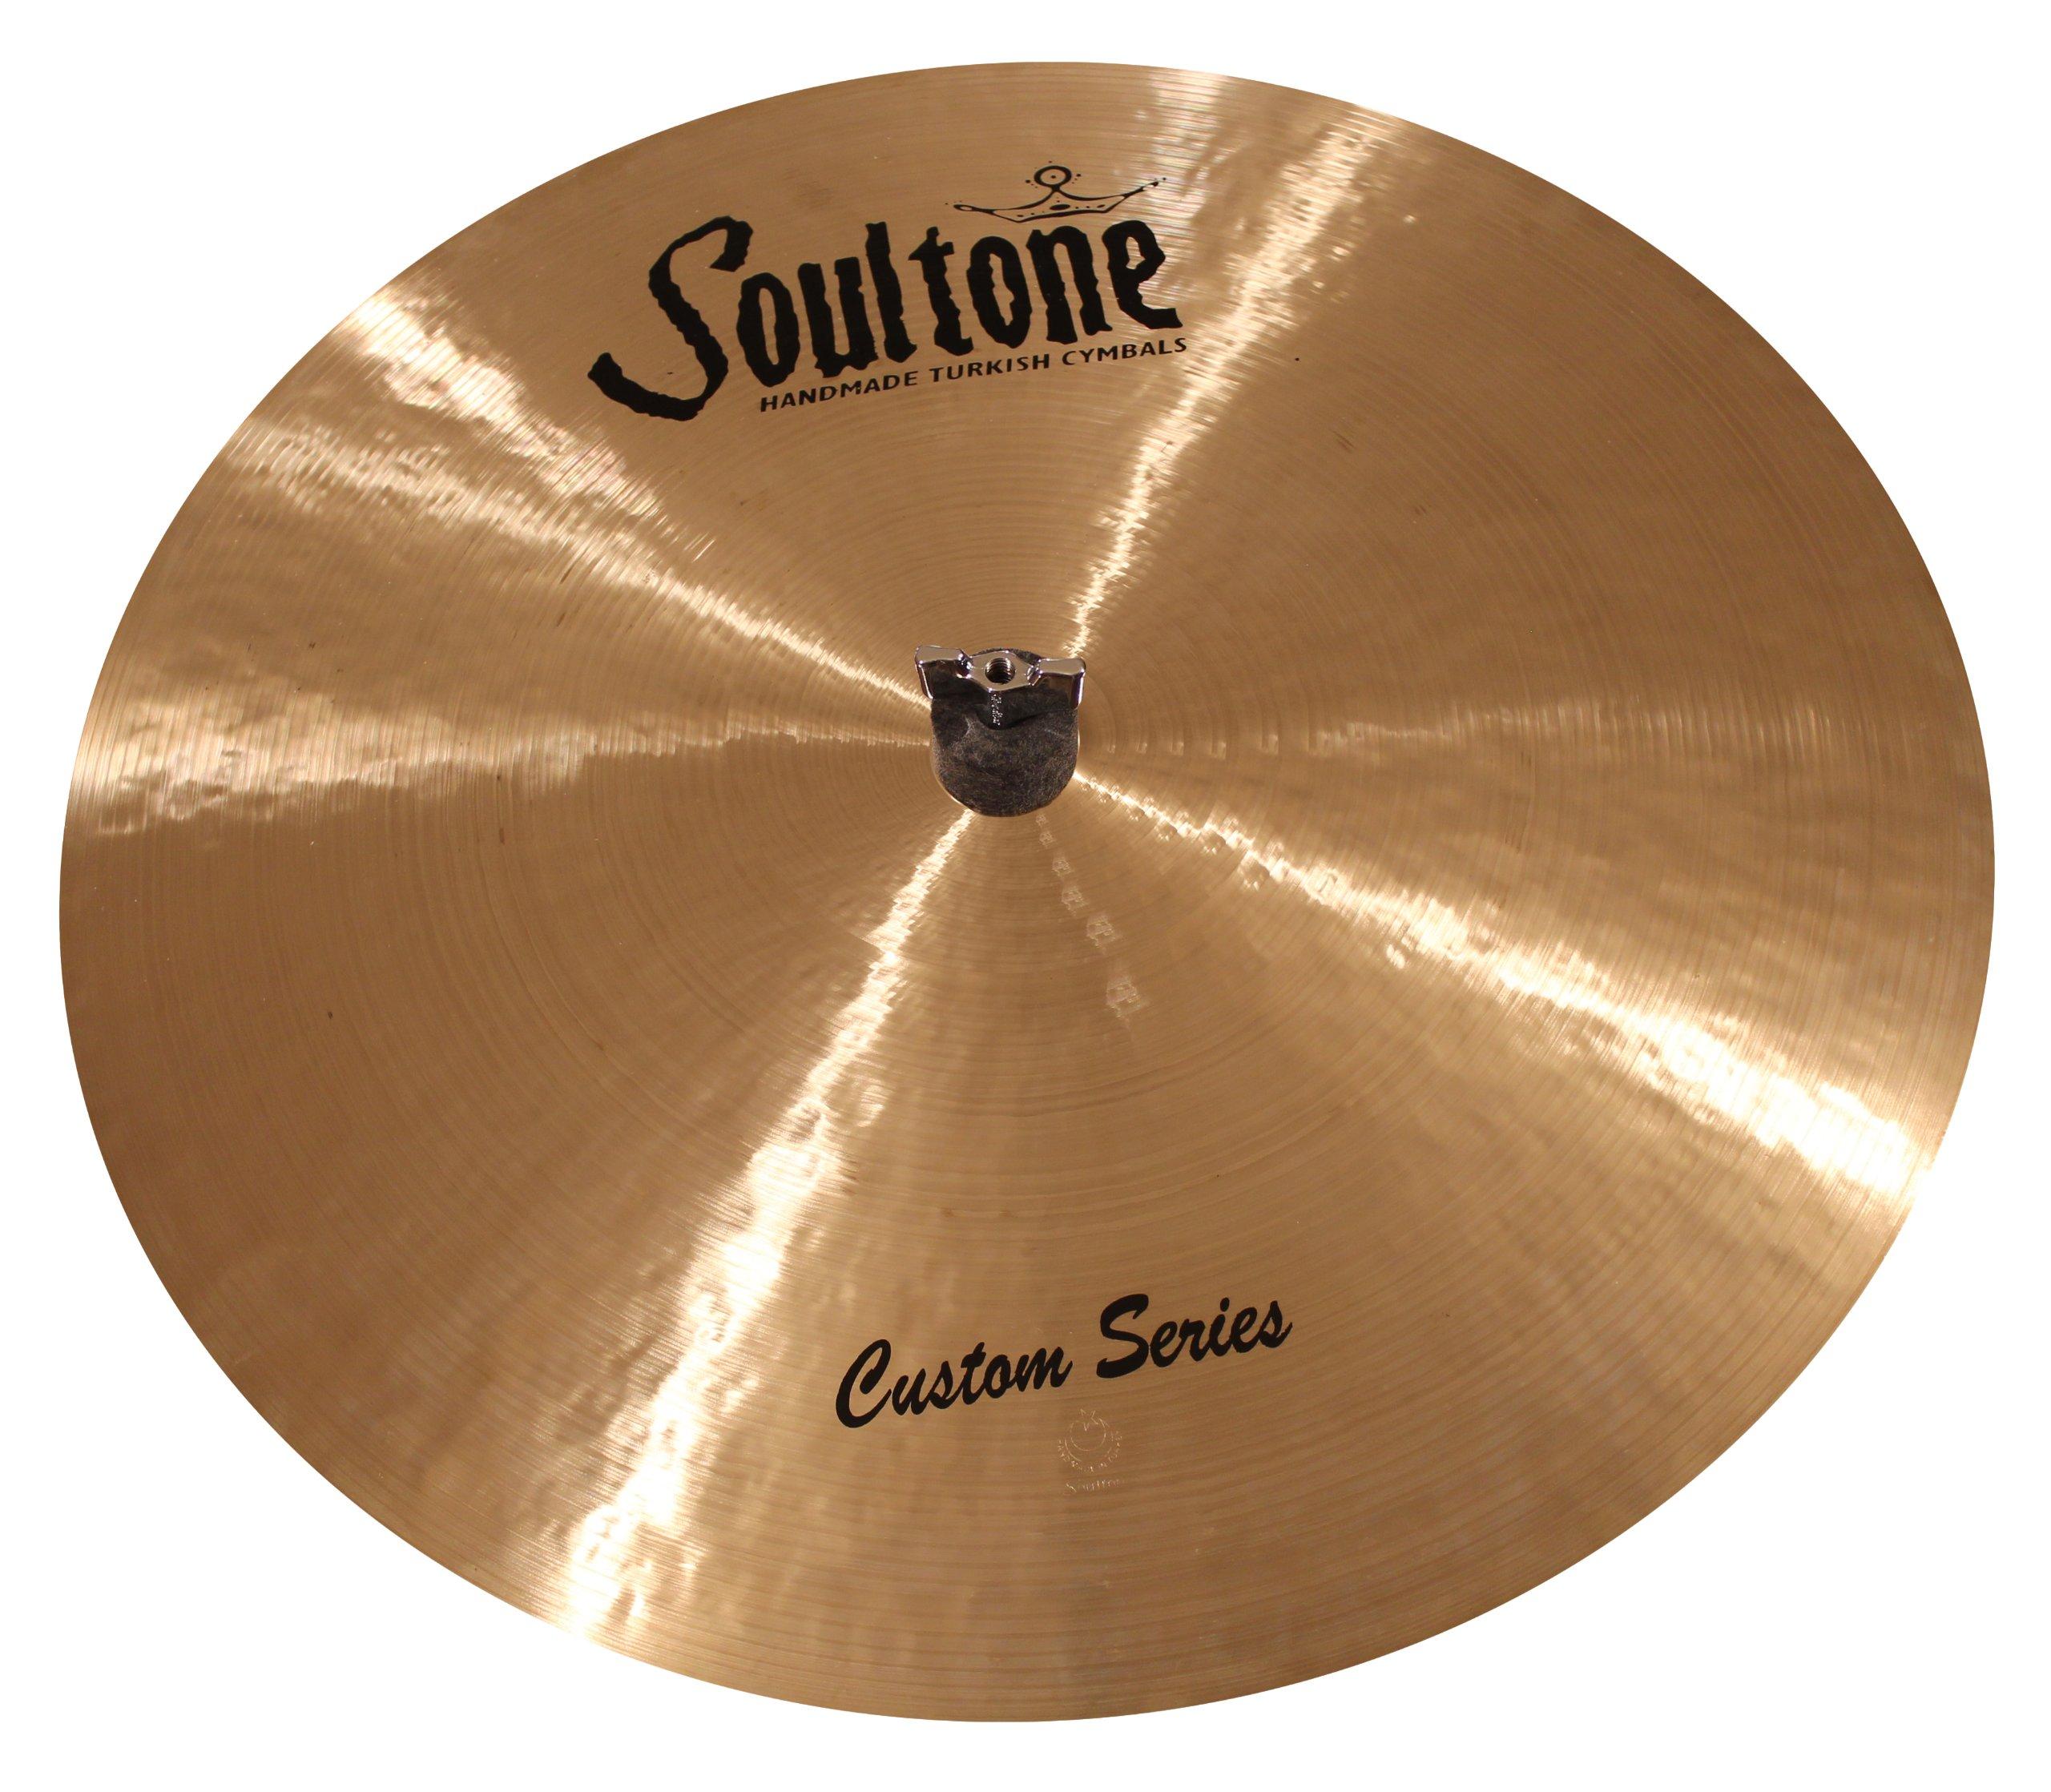 Soultone Cymbals CST-FLRID18-18'' Custom Flat Ride by Soultone Cymbals